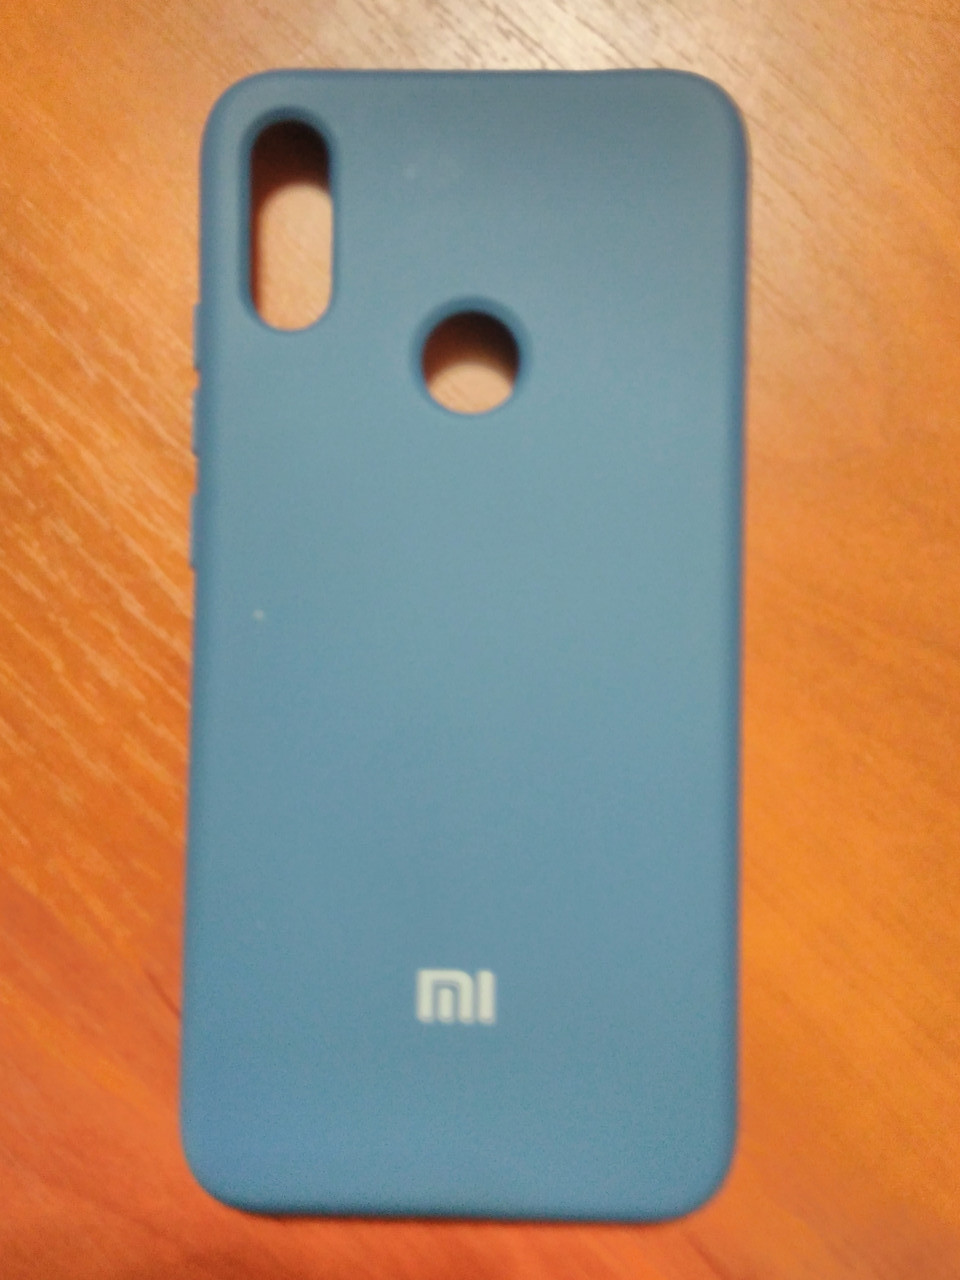 Накладка   Silicon Cover full   для  Xiaomi Redmi Note 7 / Note 7 Pro (темно-синий)